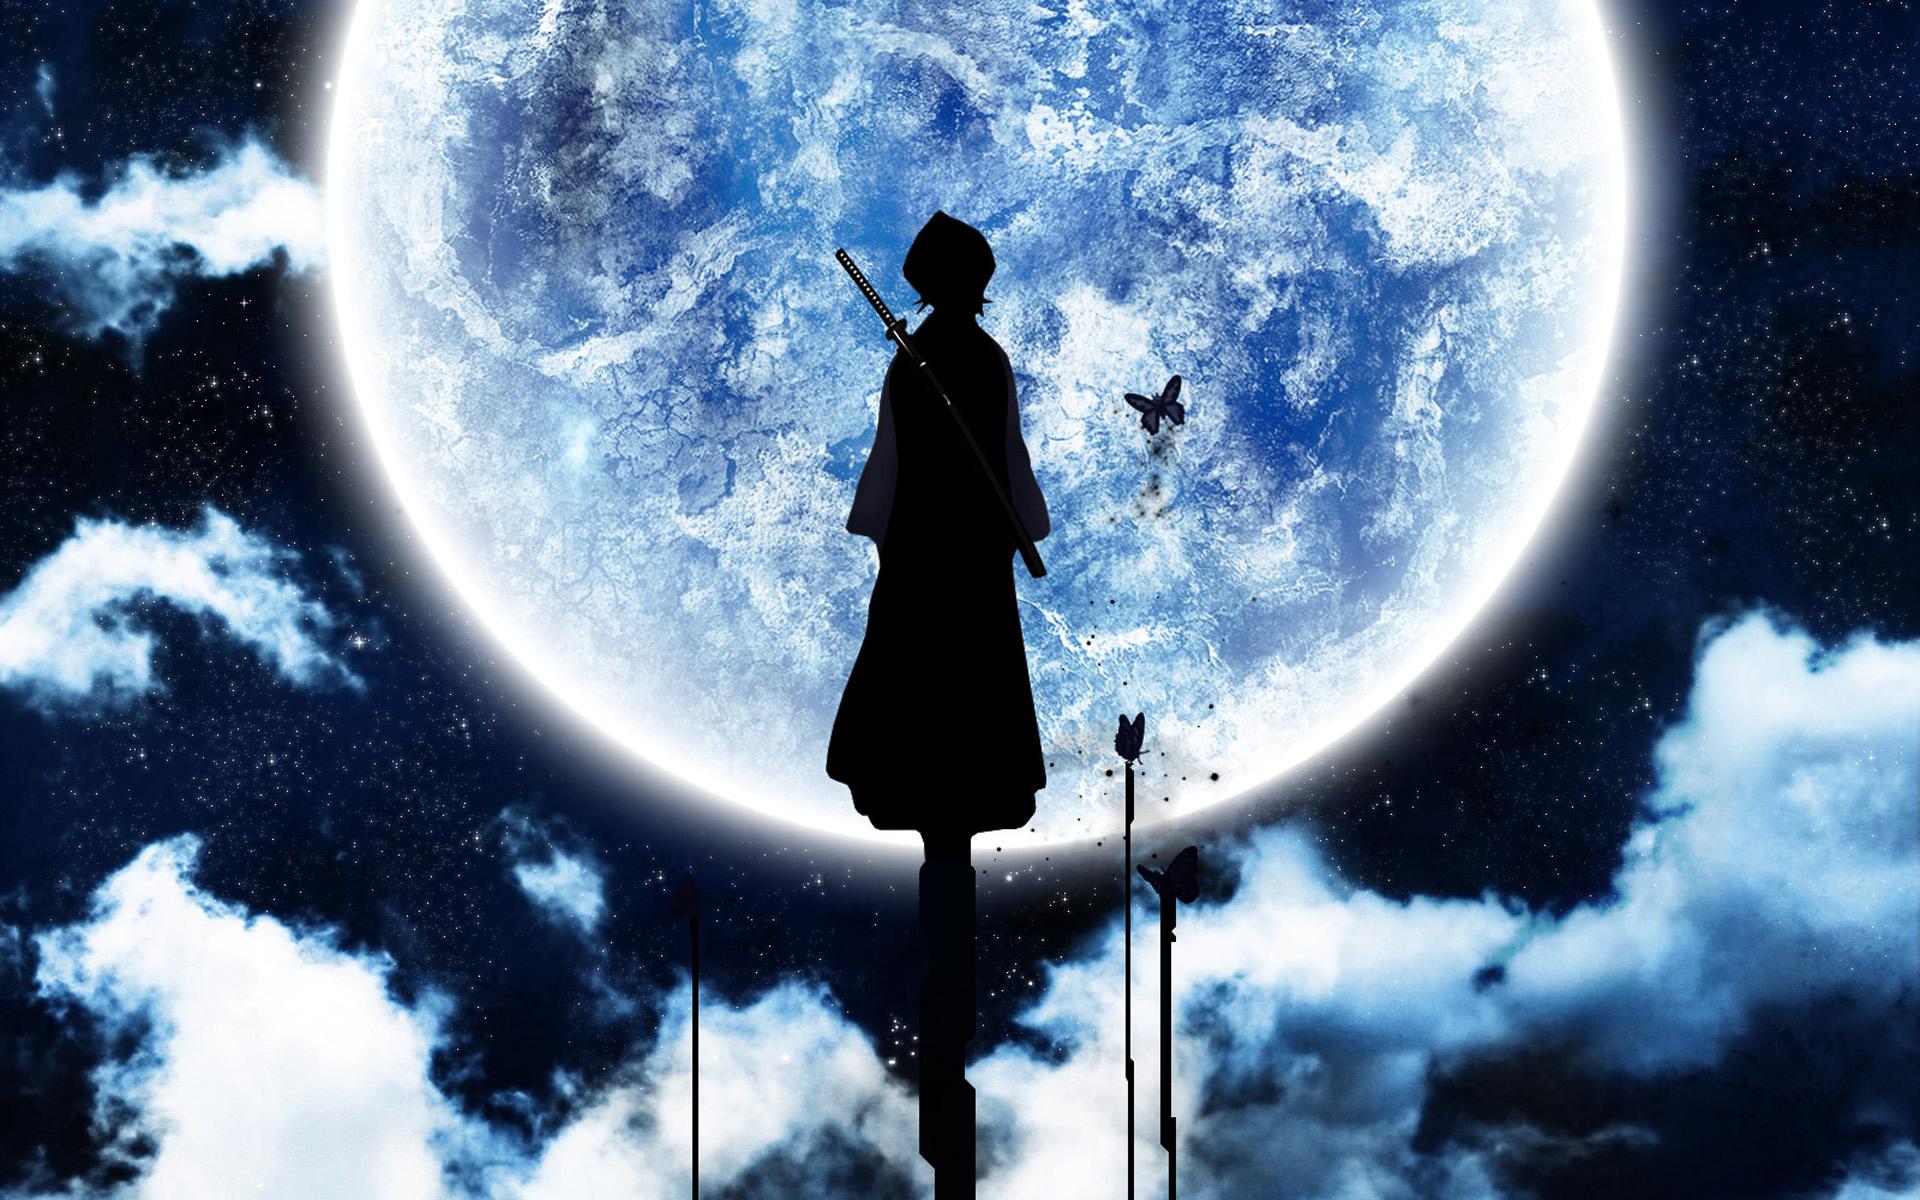 Anime Bleach Wallpaper HD ImageBankbiz 1920x1200